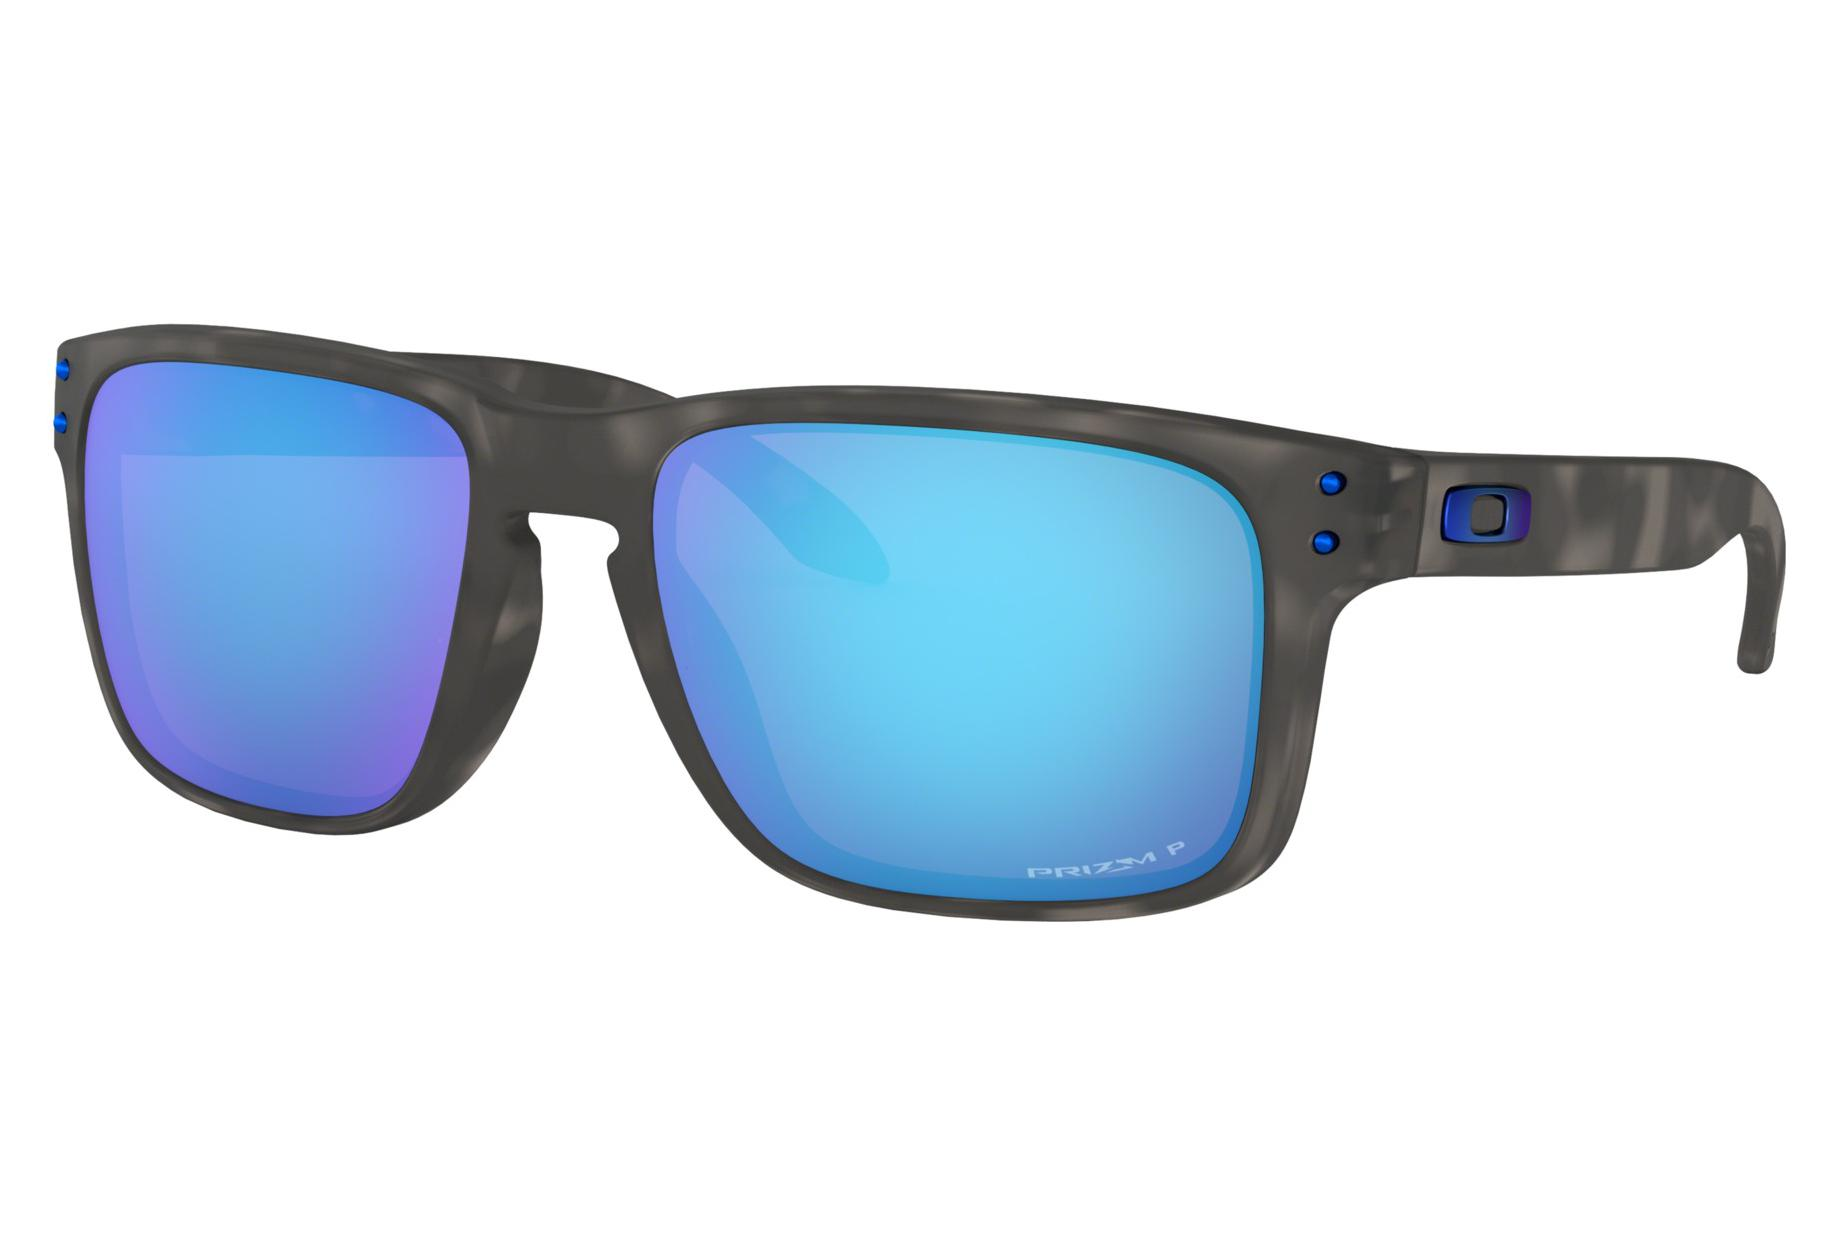 fcc8a2adff Gafas de sol Oakley Holbrook Prizm Sapphire Polarized / Negro / Ref ...